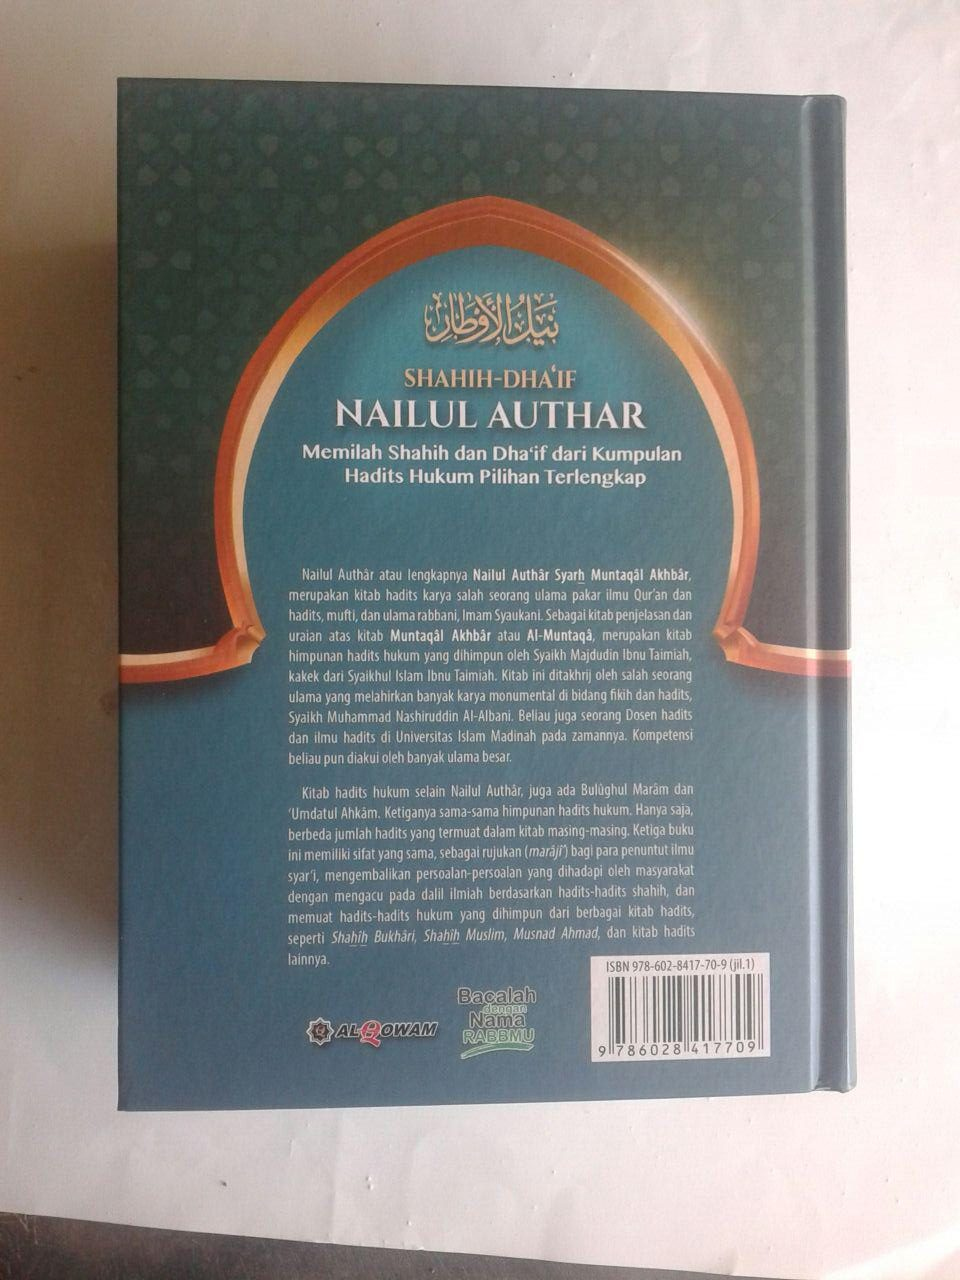 Buku Shahih Dhaif Nailul Authar Kumpulan Hadits Hukum Terlengkap cover 6